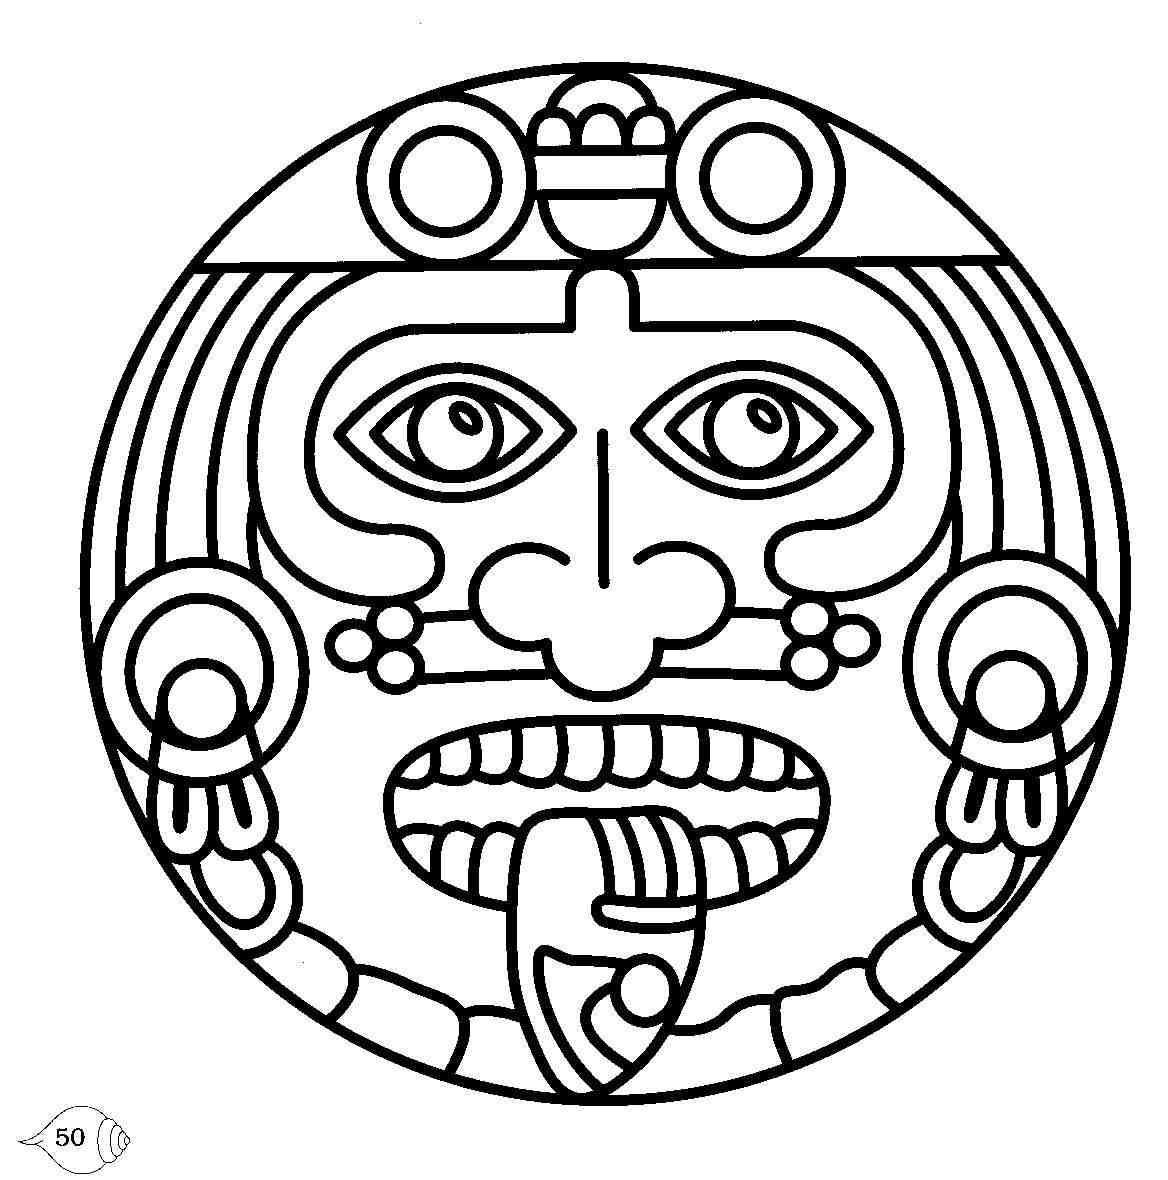 Color And Glue To Mayan Kite Aztec Symbols Aztec Art Mayan Symbols